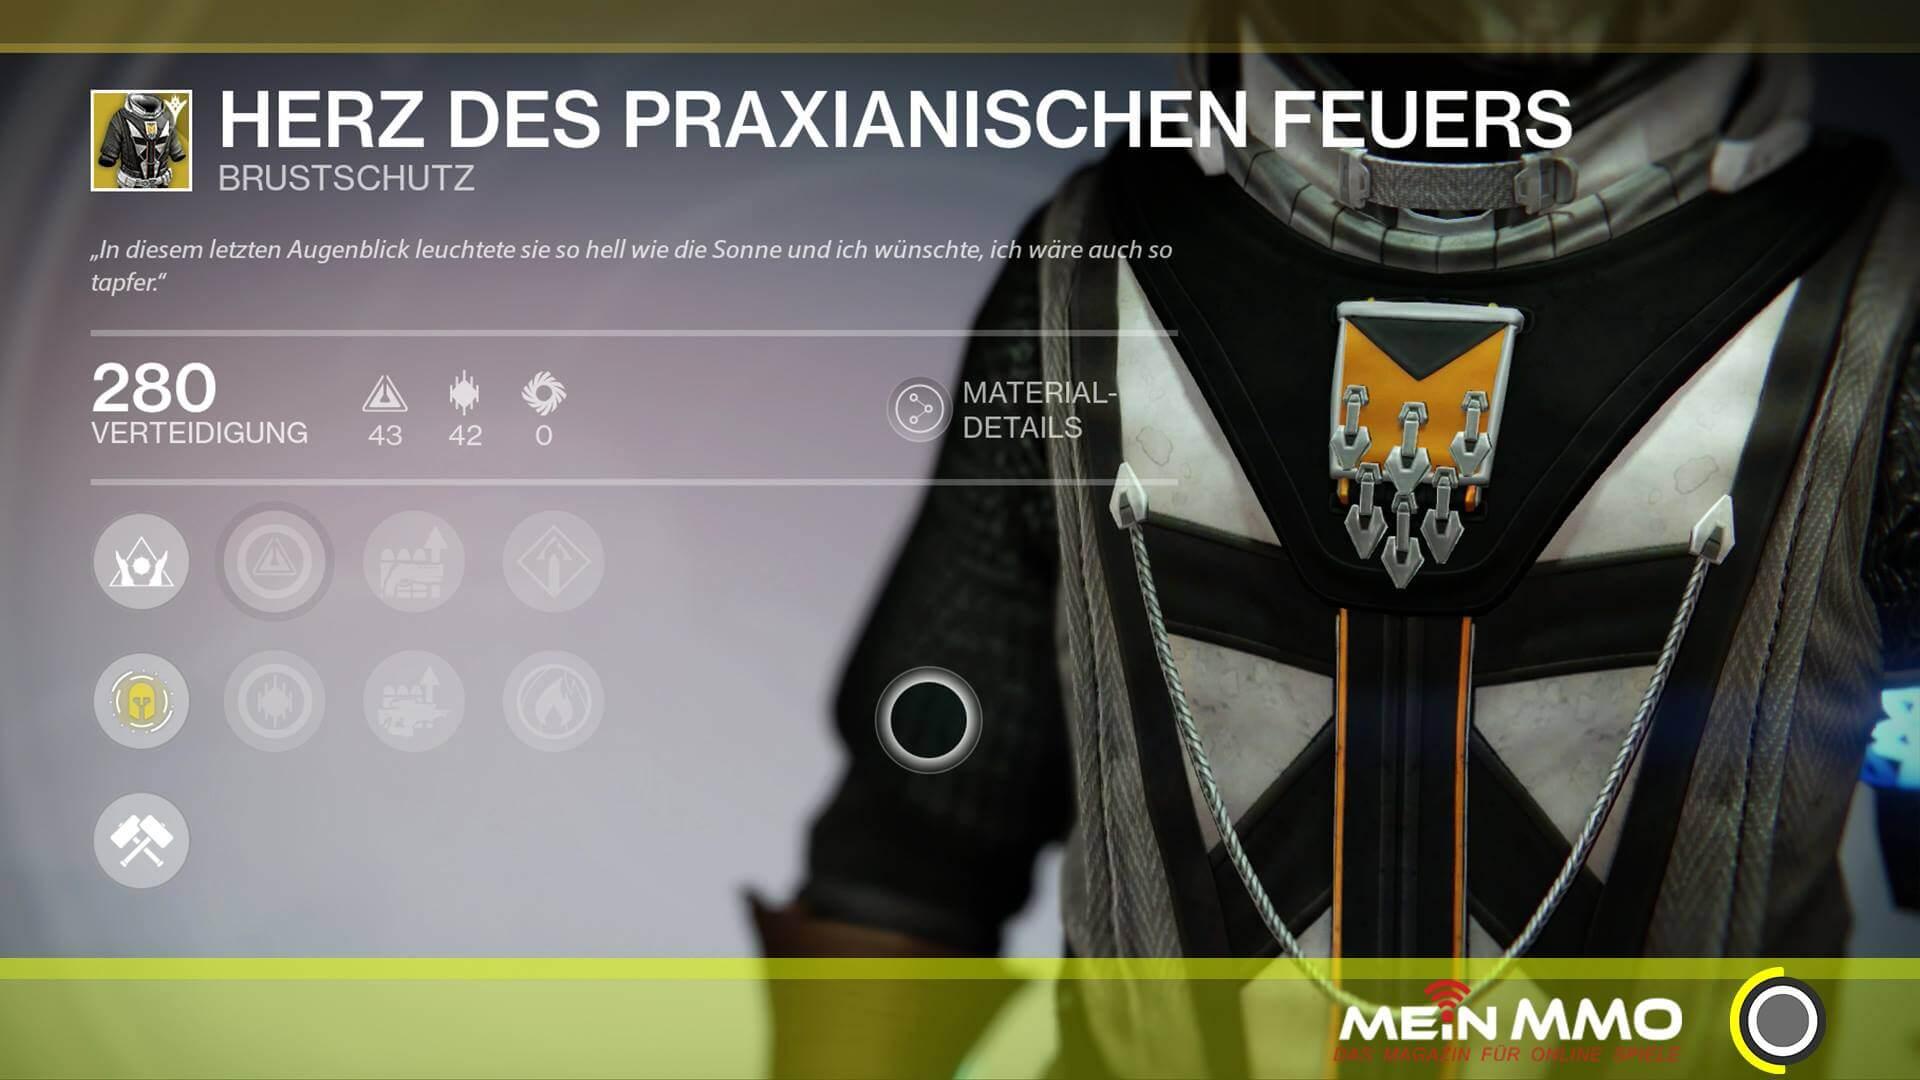 Destiny-Praxianisches-Feuer-1812